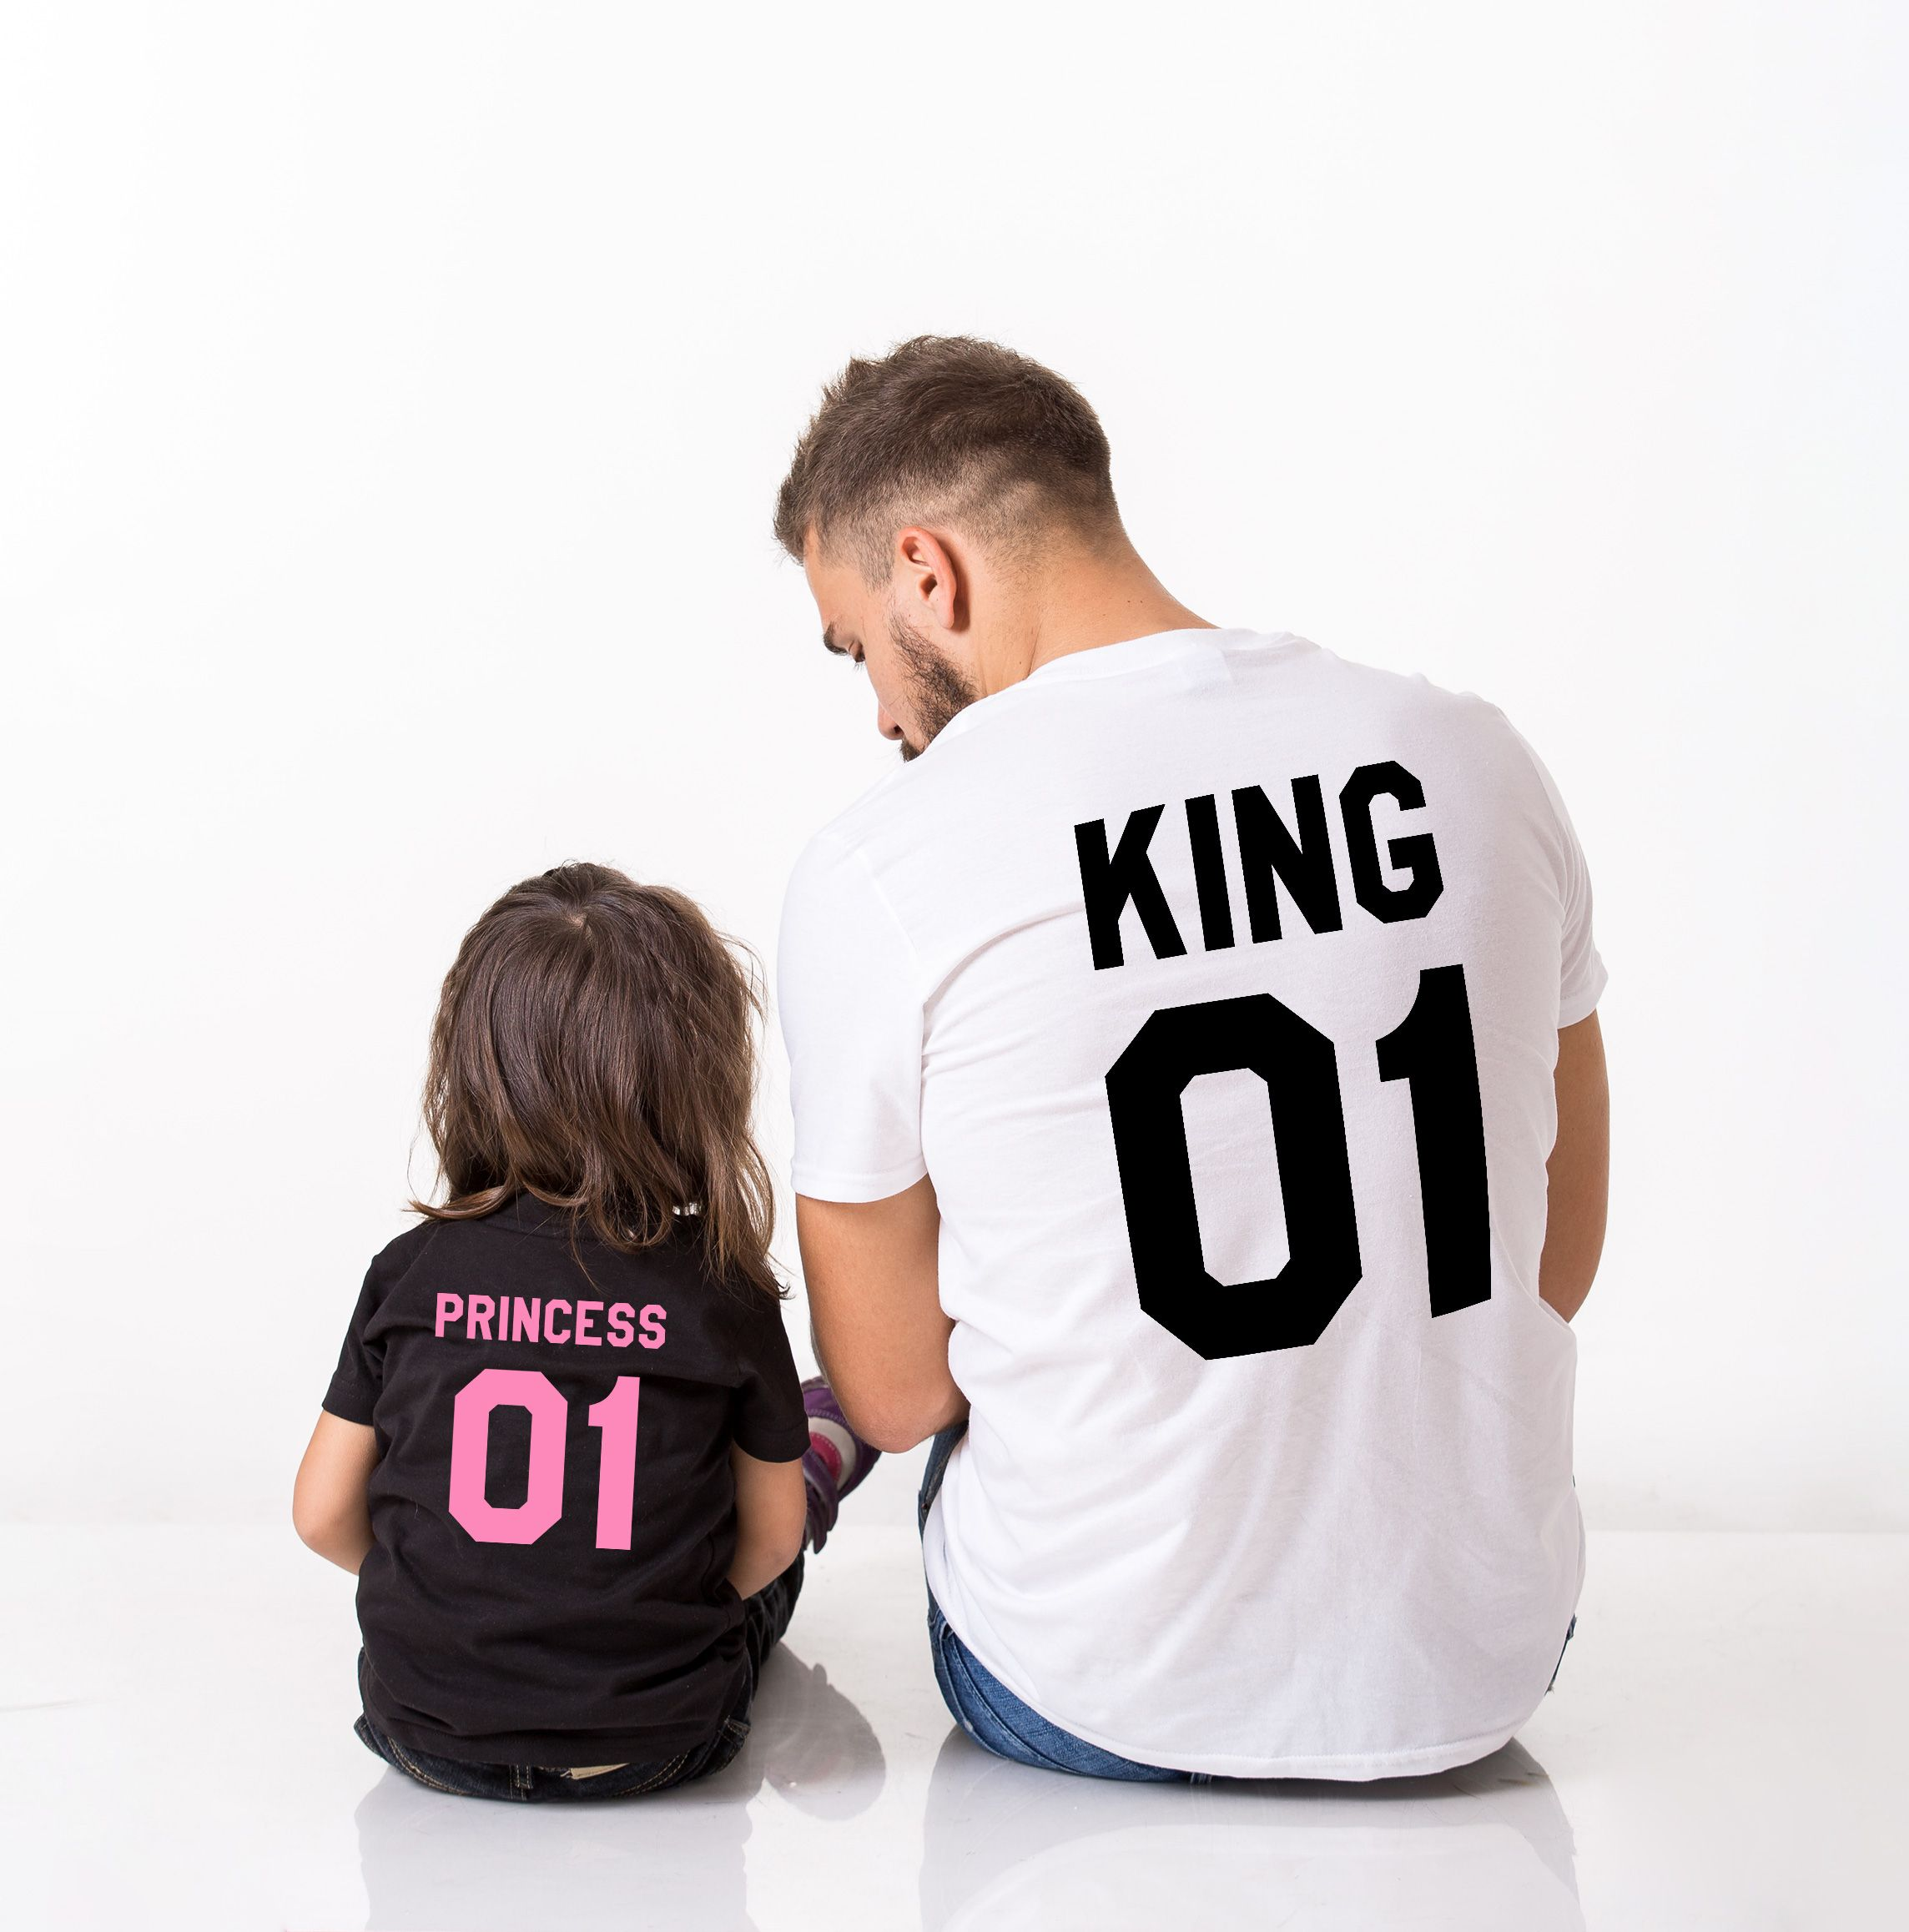 king princess - photo #31